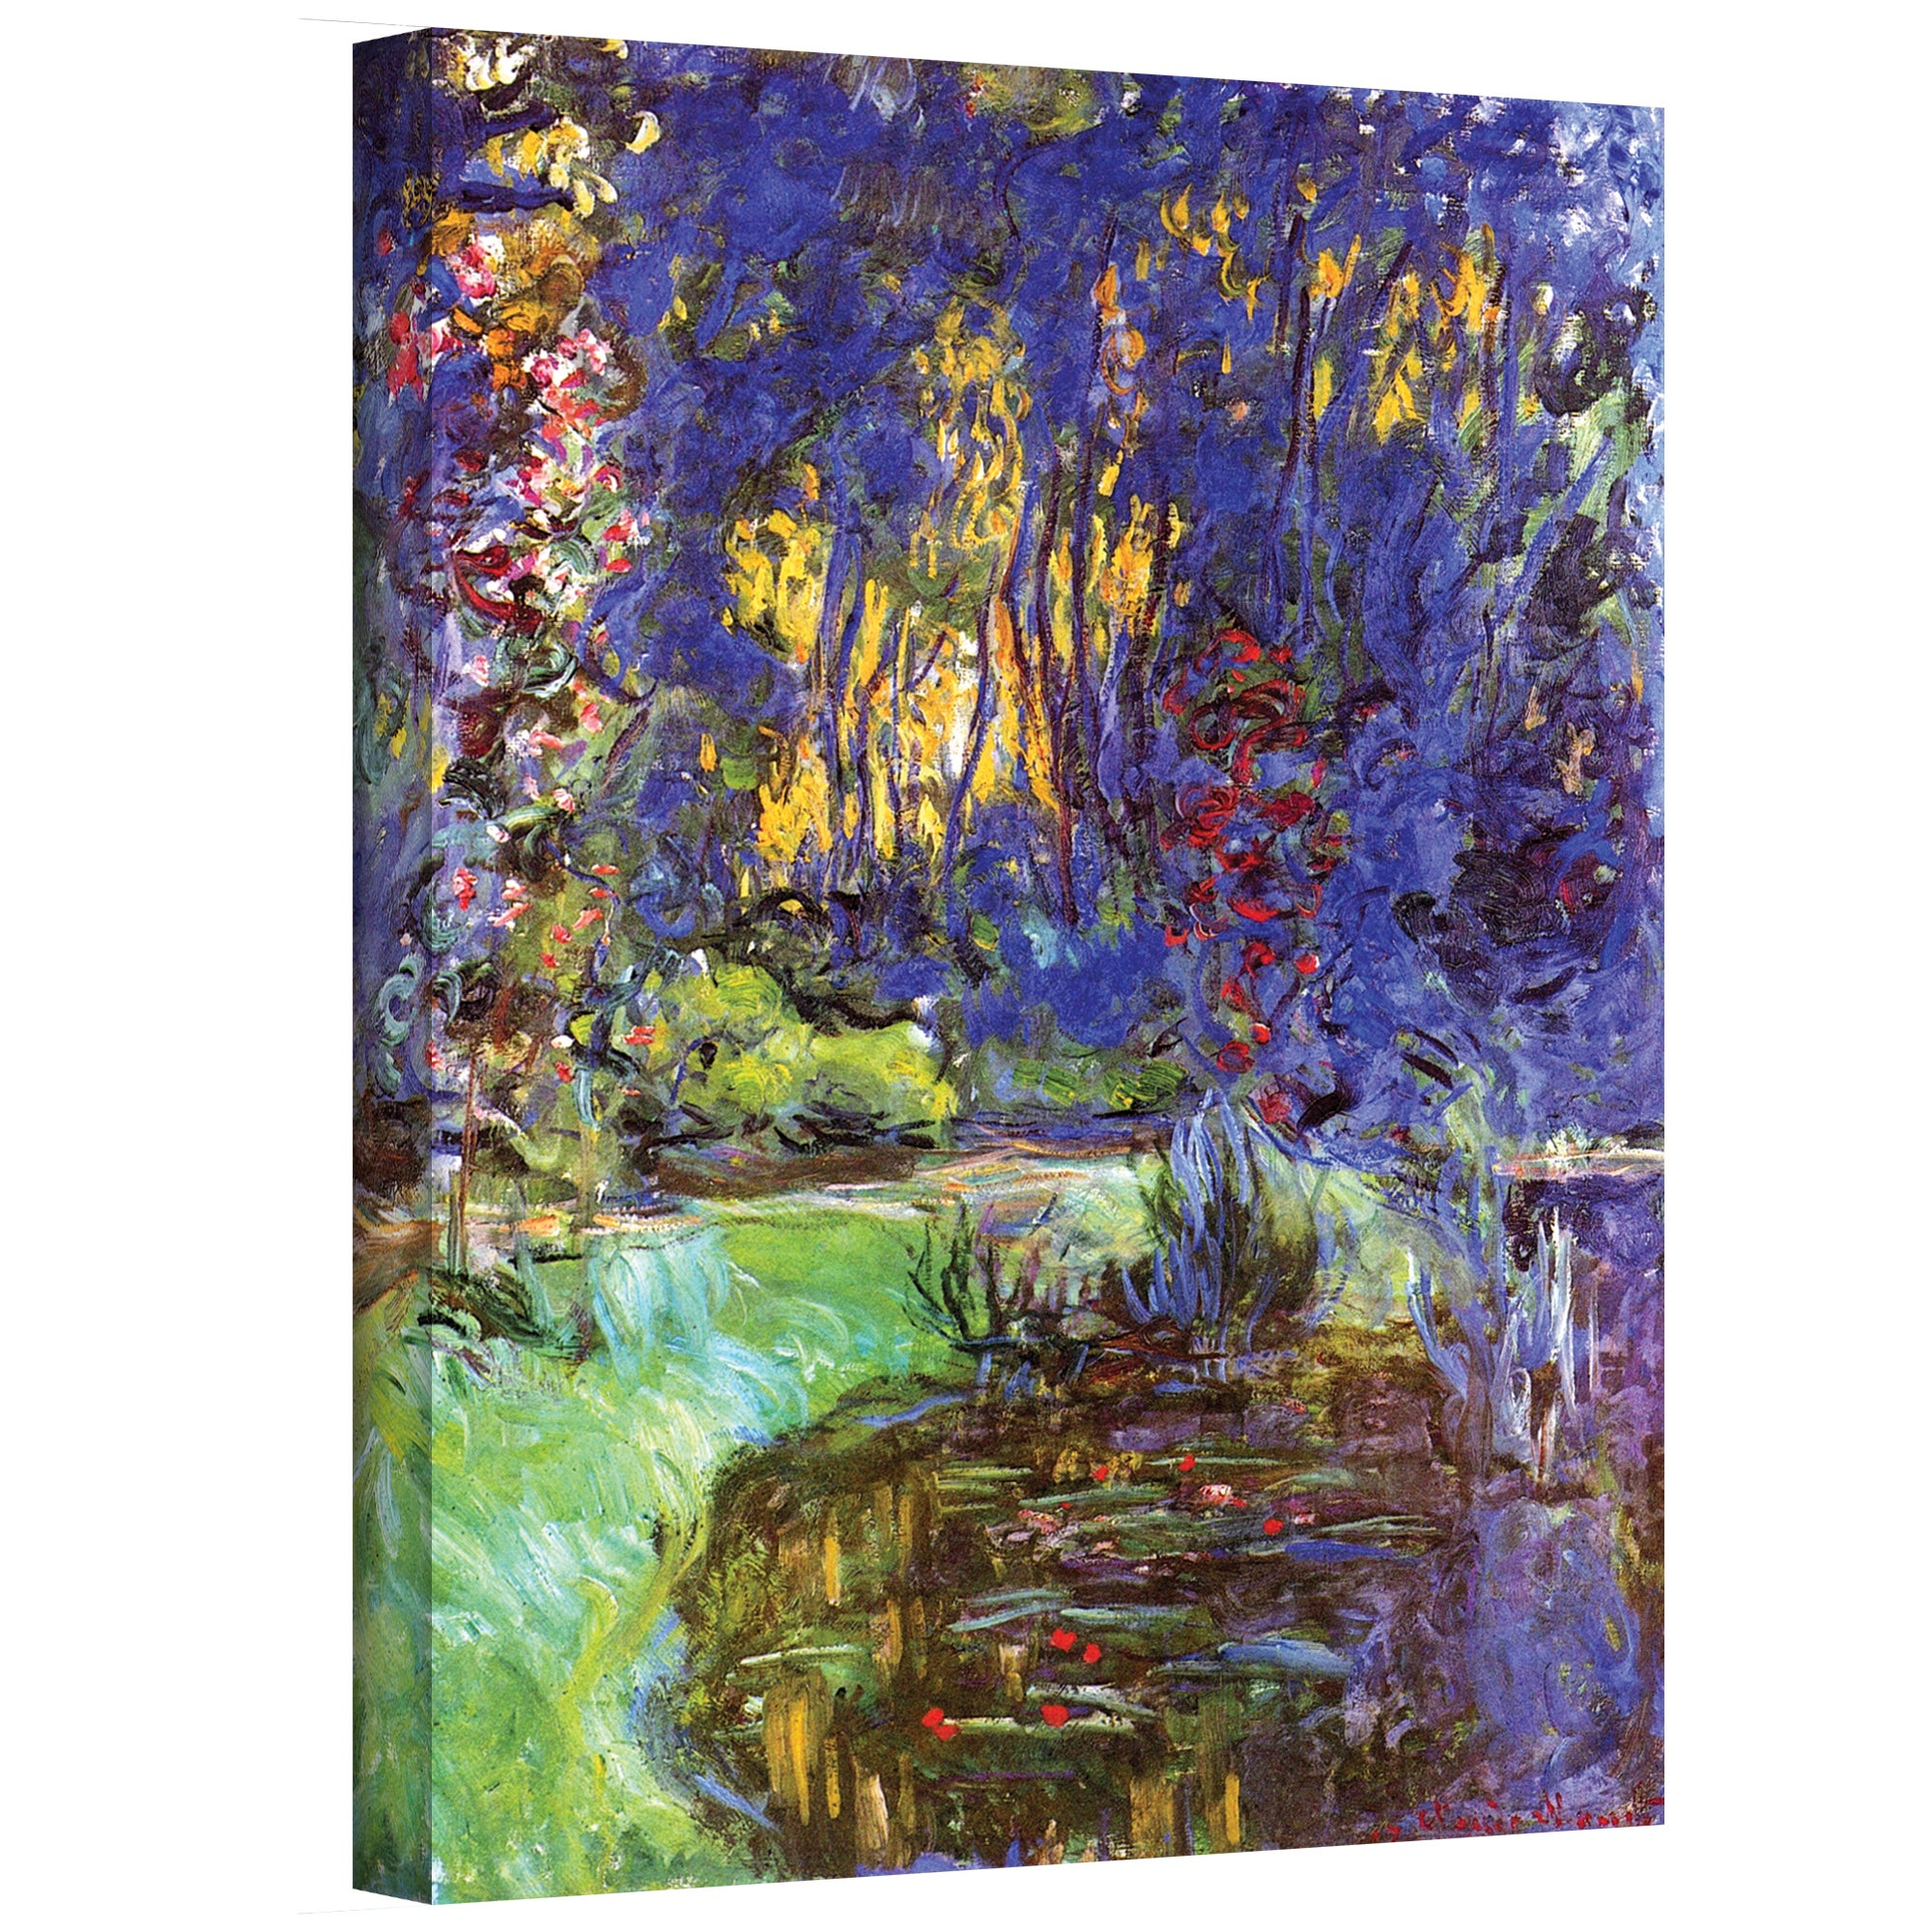 Monet Bridge Over Sea Rose Pond Wood Framed Canvas Print Repro 8x10